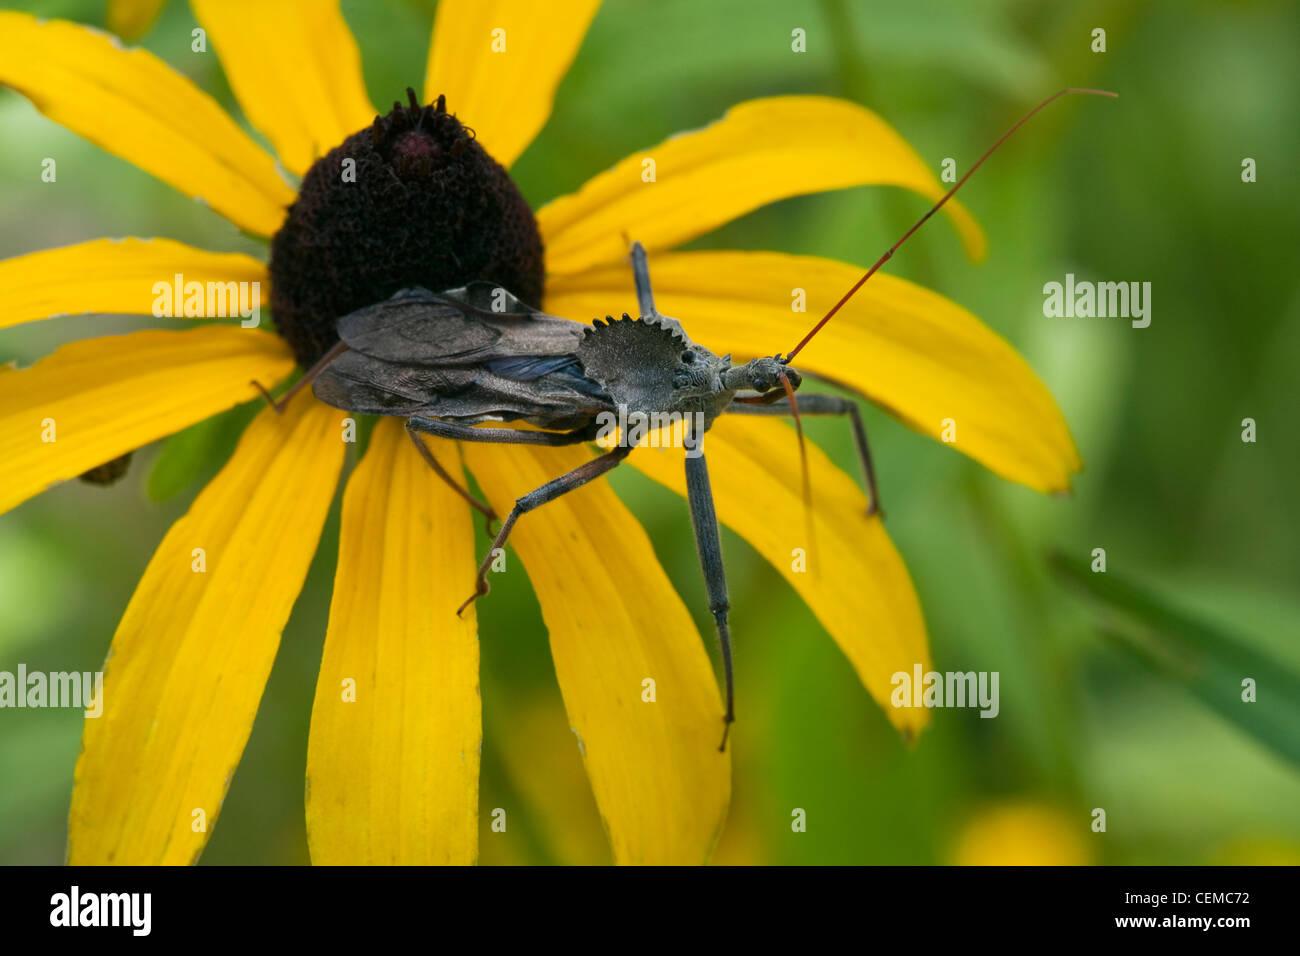 A Wheel Bug, aka. Sail-back Dinosaur Bug (Arilus cristatus) resting on a Black-eyed Susan (Rudbeckia hirta) / Kansas, - Stock Image